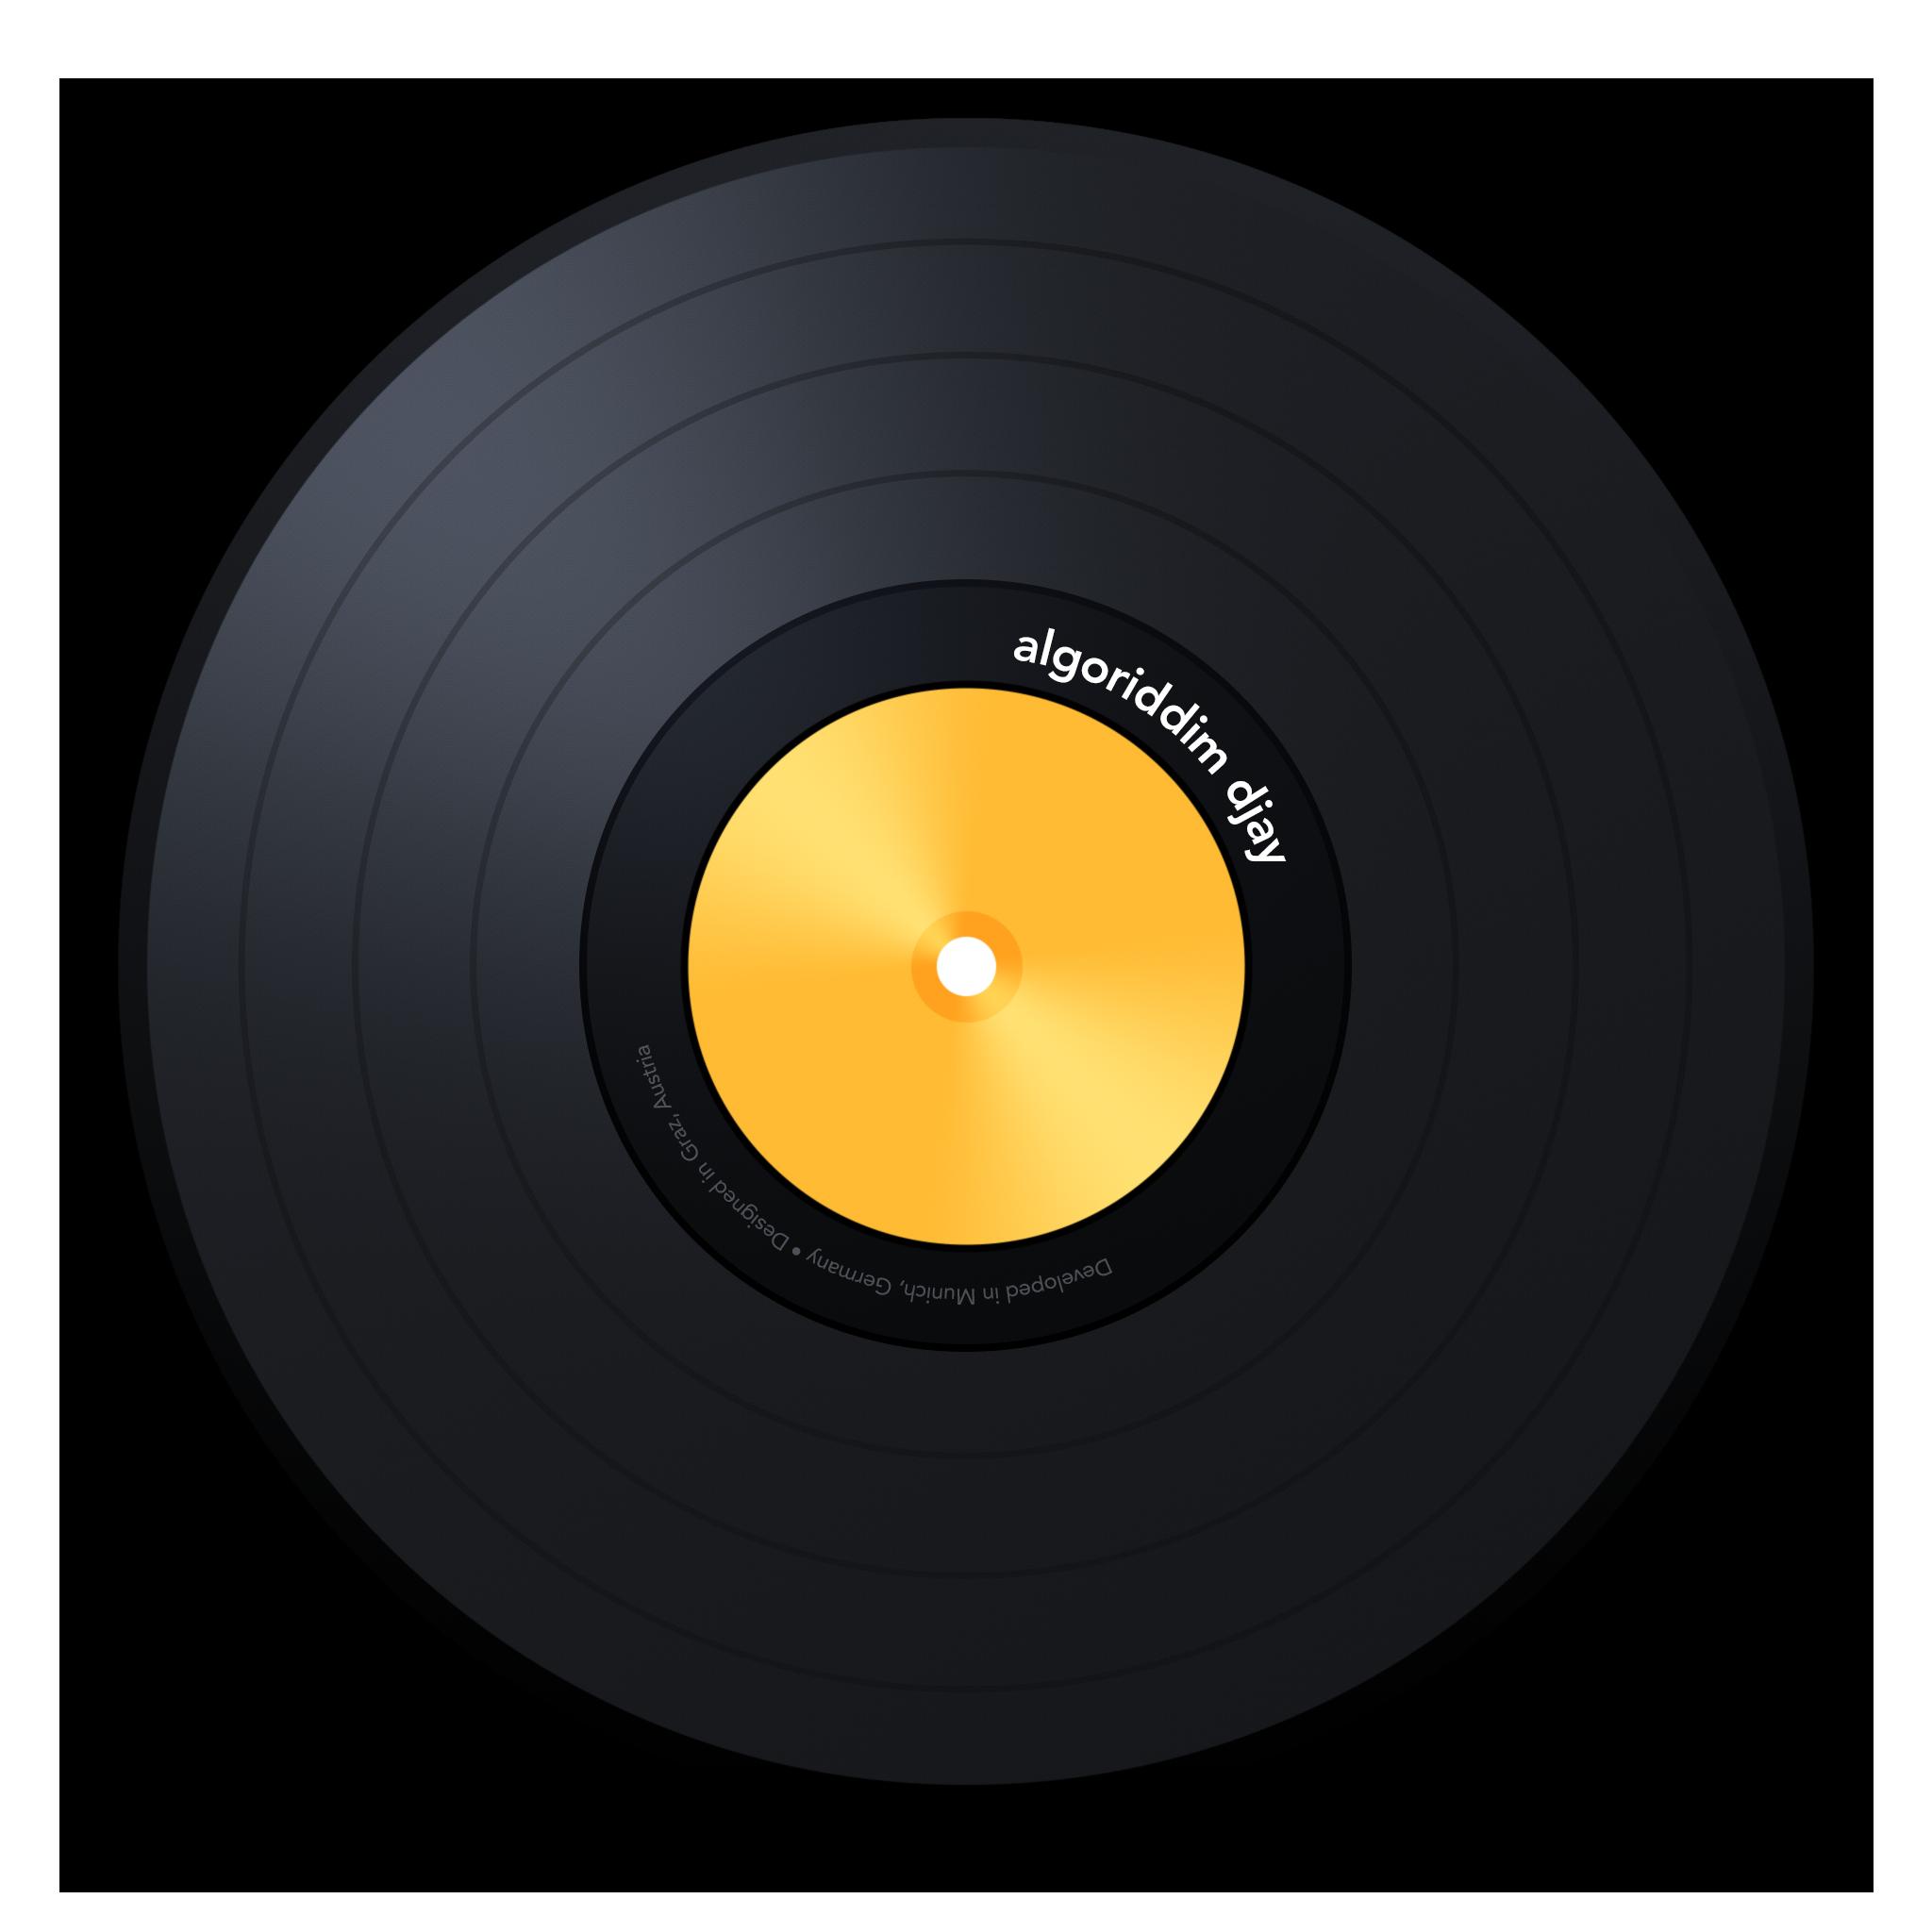 Algoriddim Releases djay Pro for Mac [Video] Dj system